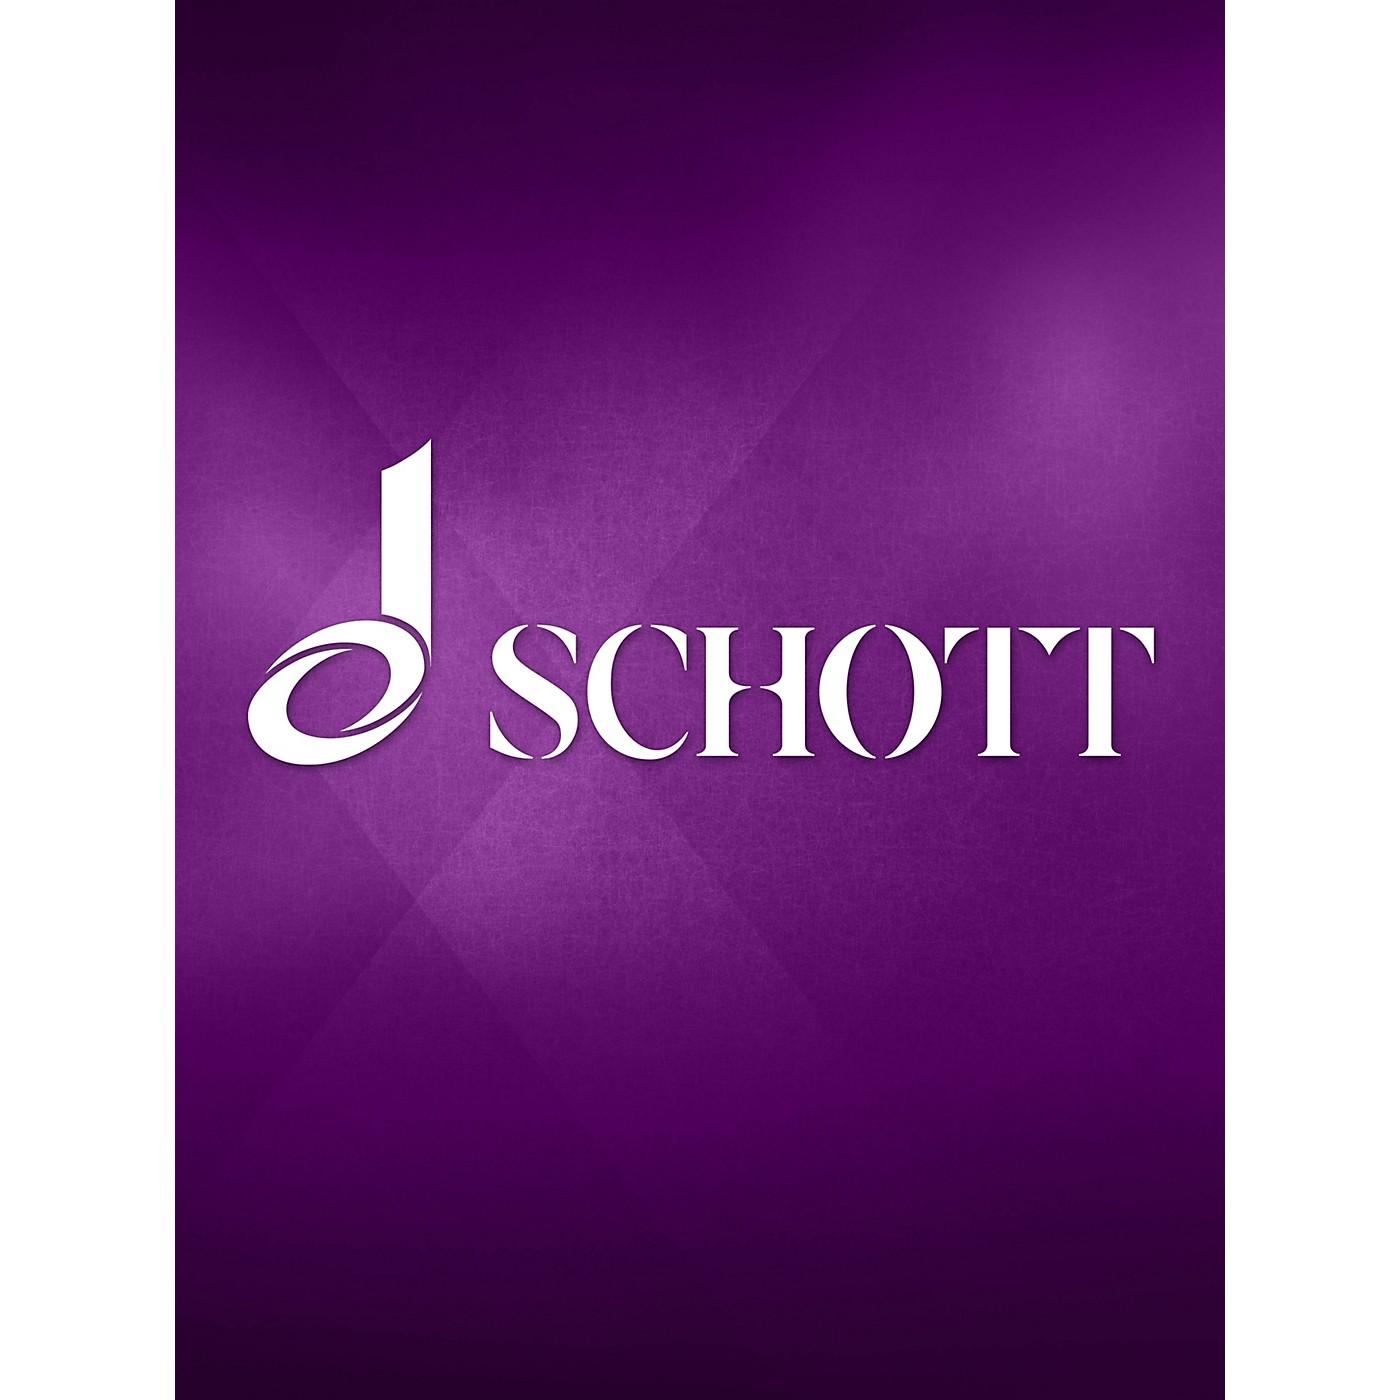 Schott Artizarra (Fantaisie sur un Chant Populaire Basque) Schott Series thumbnail